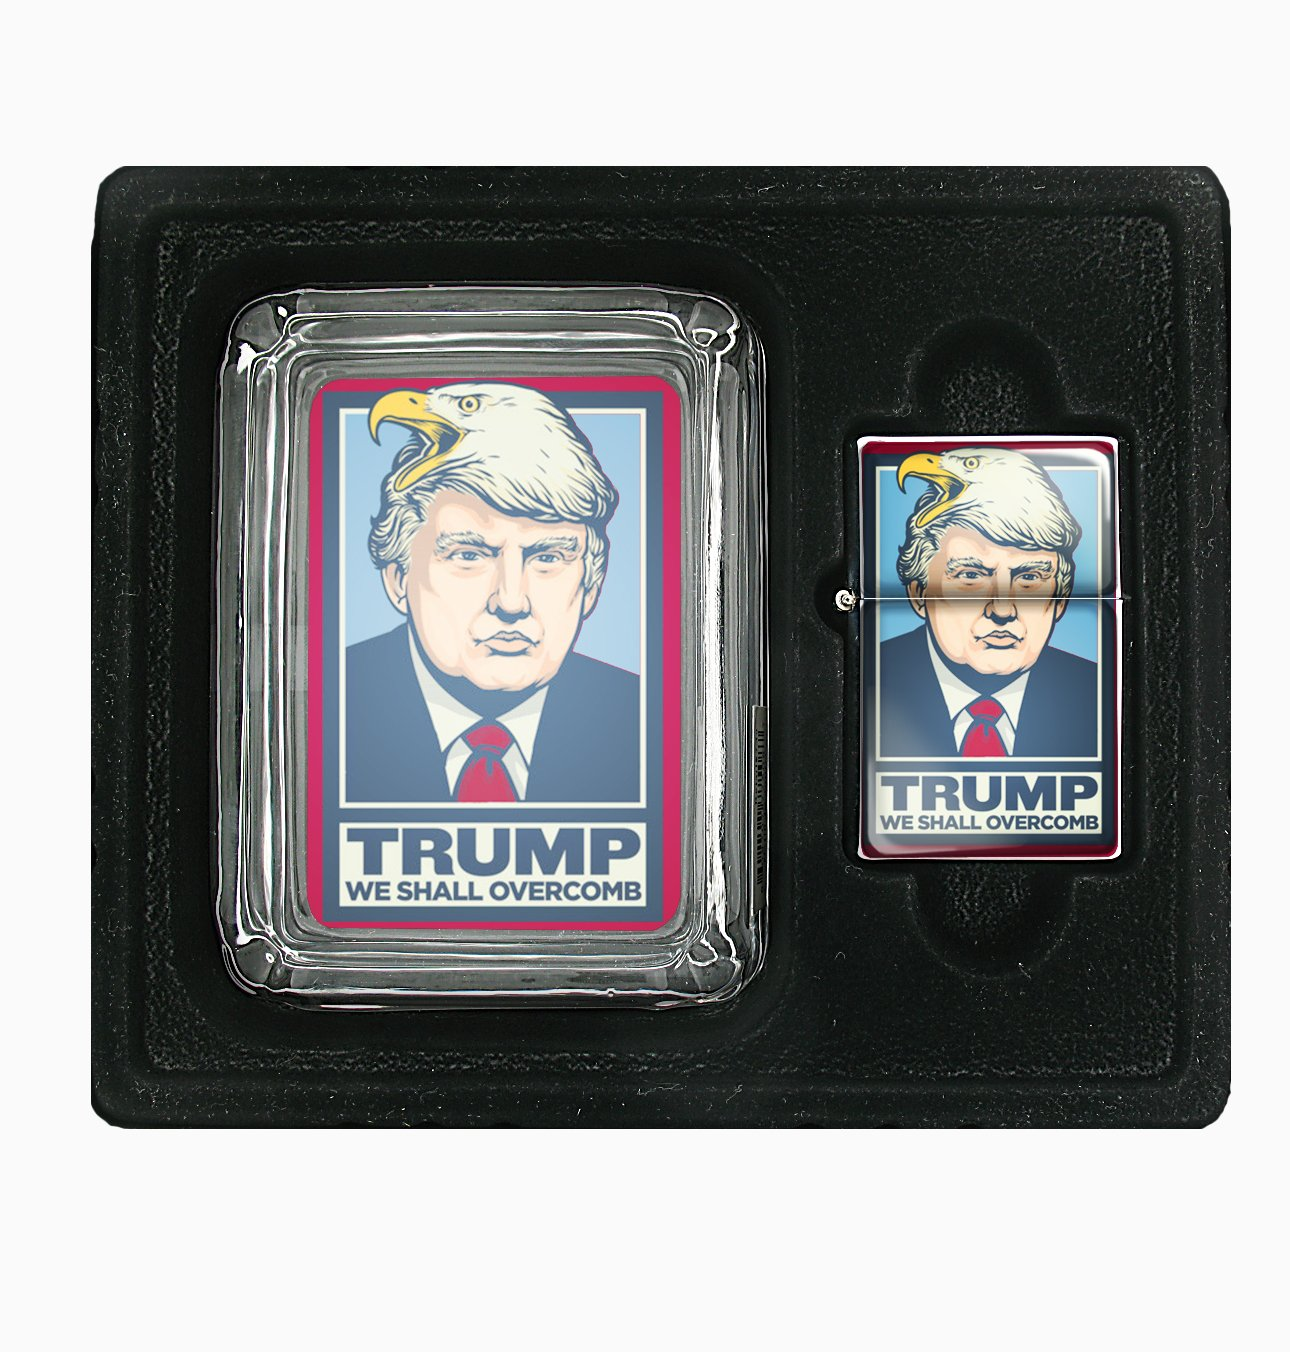 Copy of Overcomb Lighter/Astray - $14.95